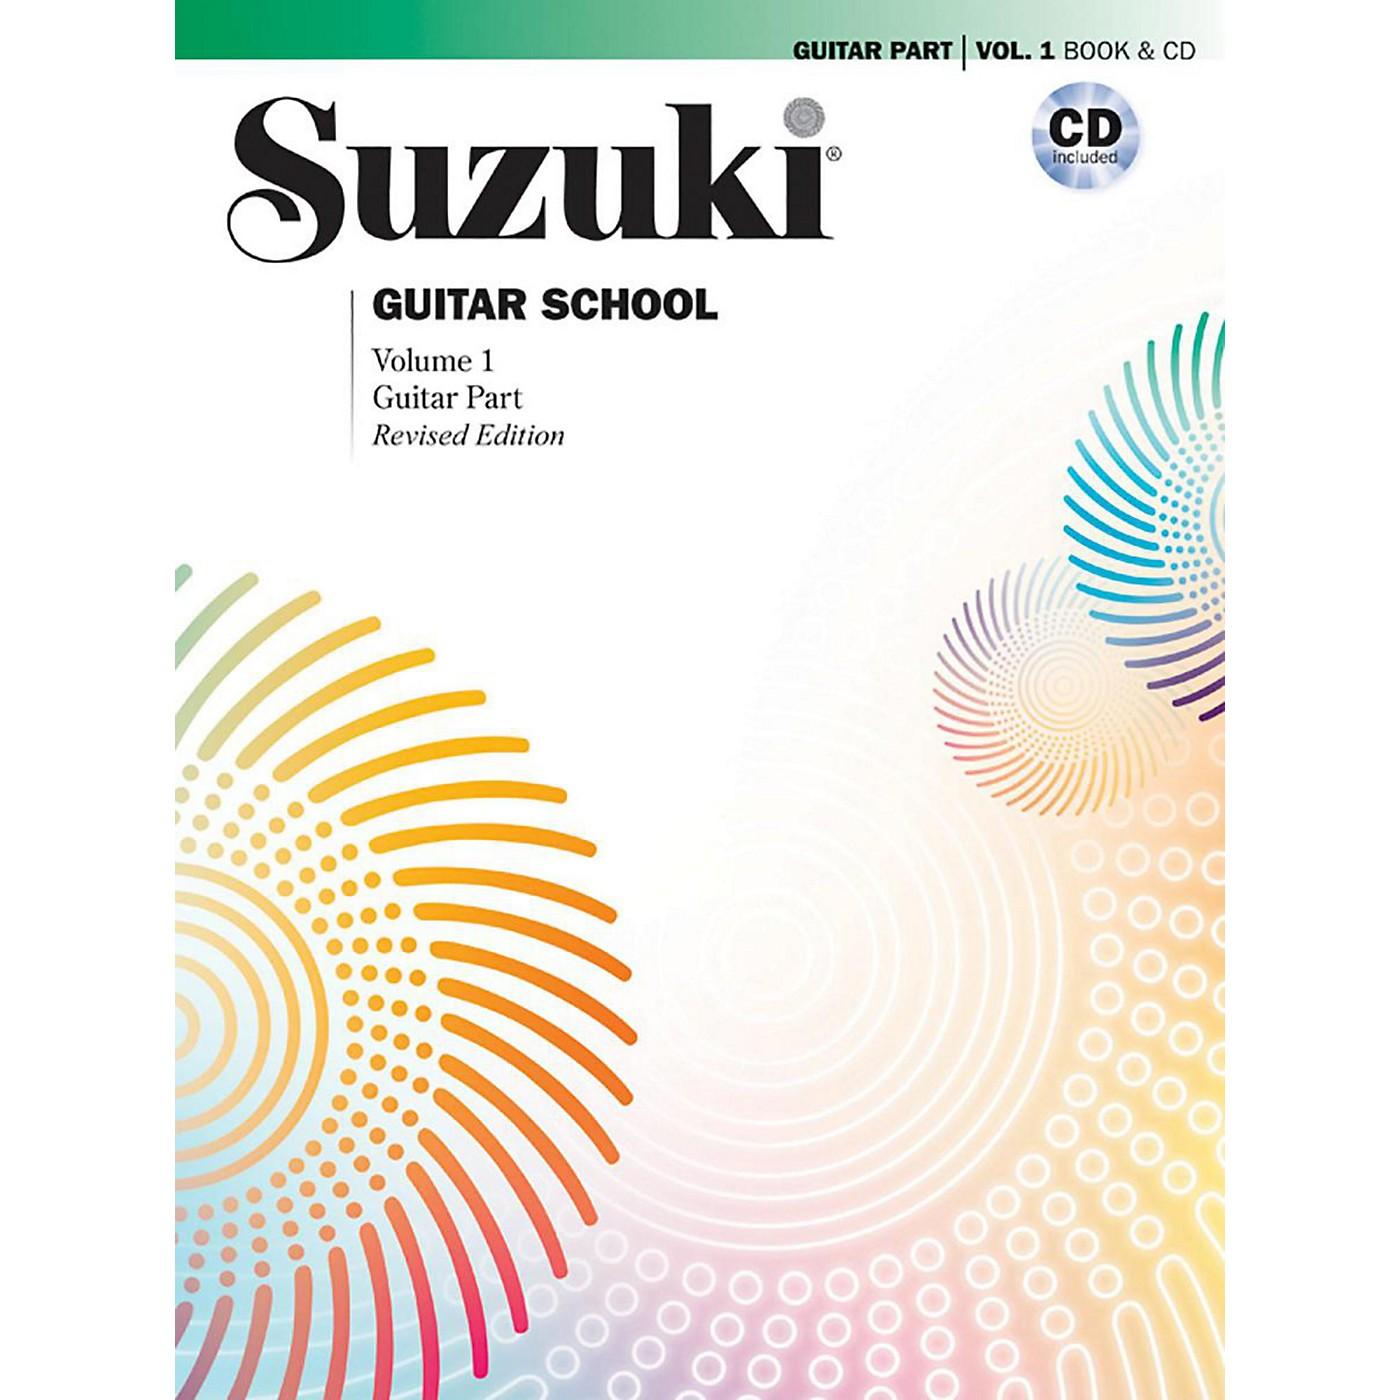 Suzuki Suzuki Guitar School Guitar Part & CD, Volume 1 Book & CD Revised thumbnail